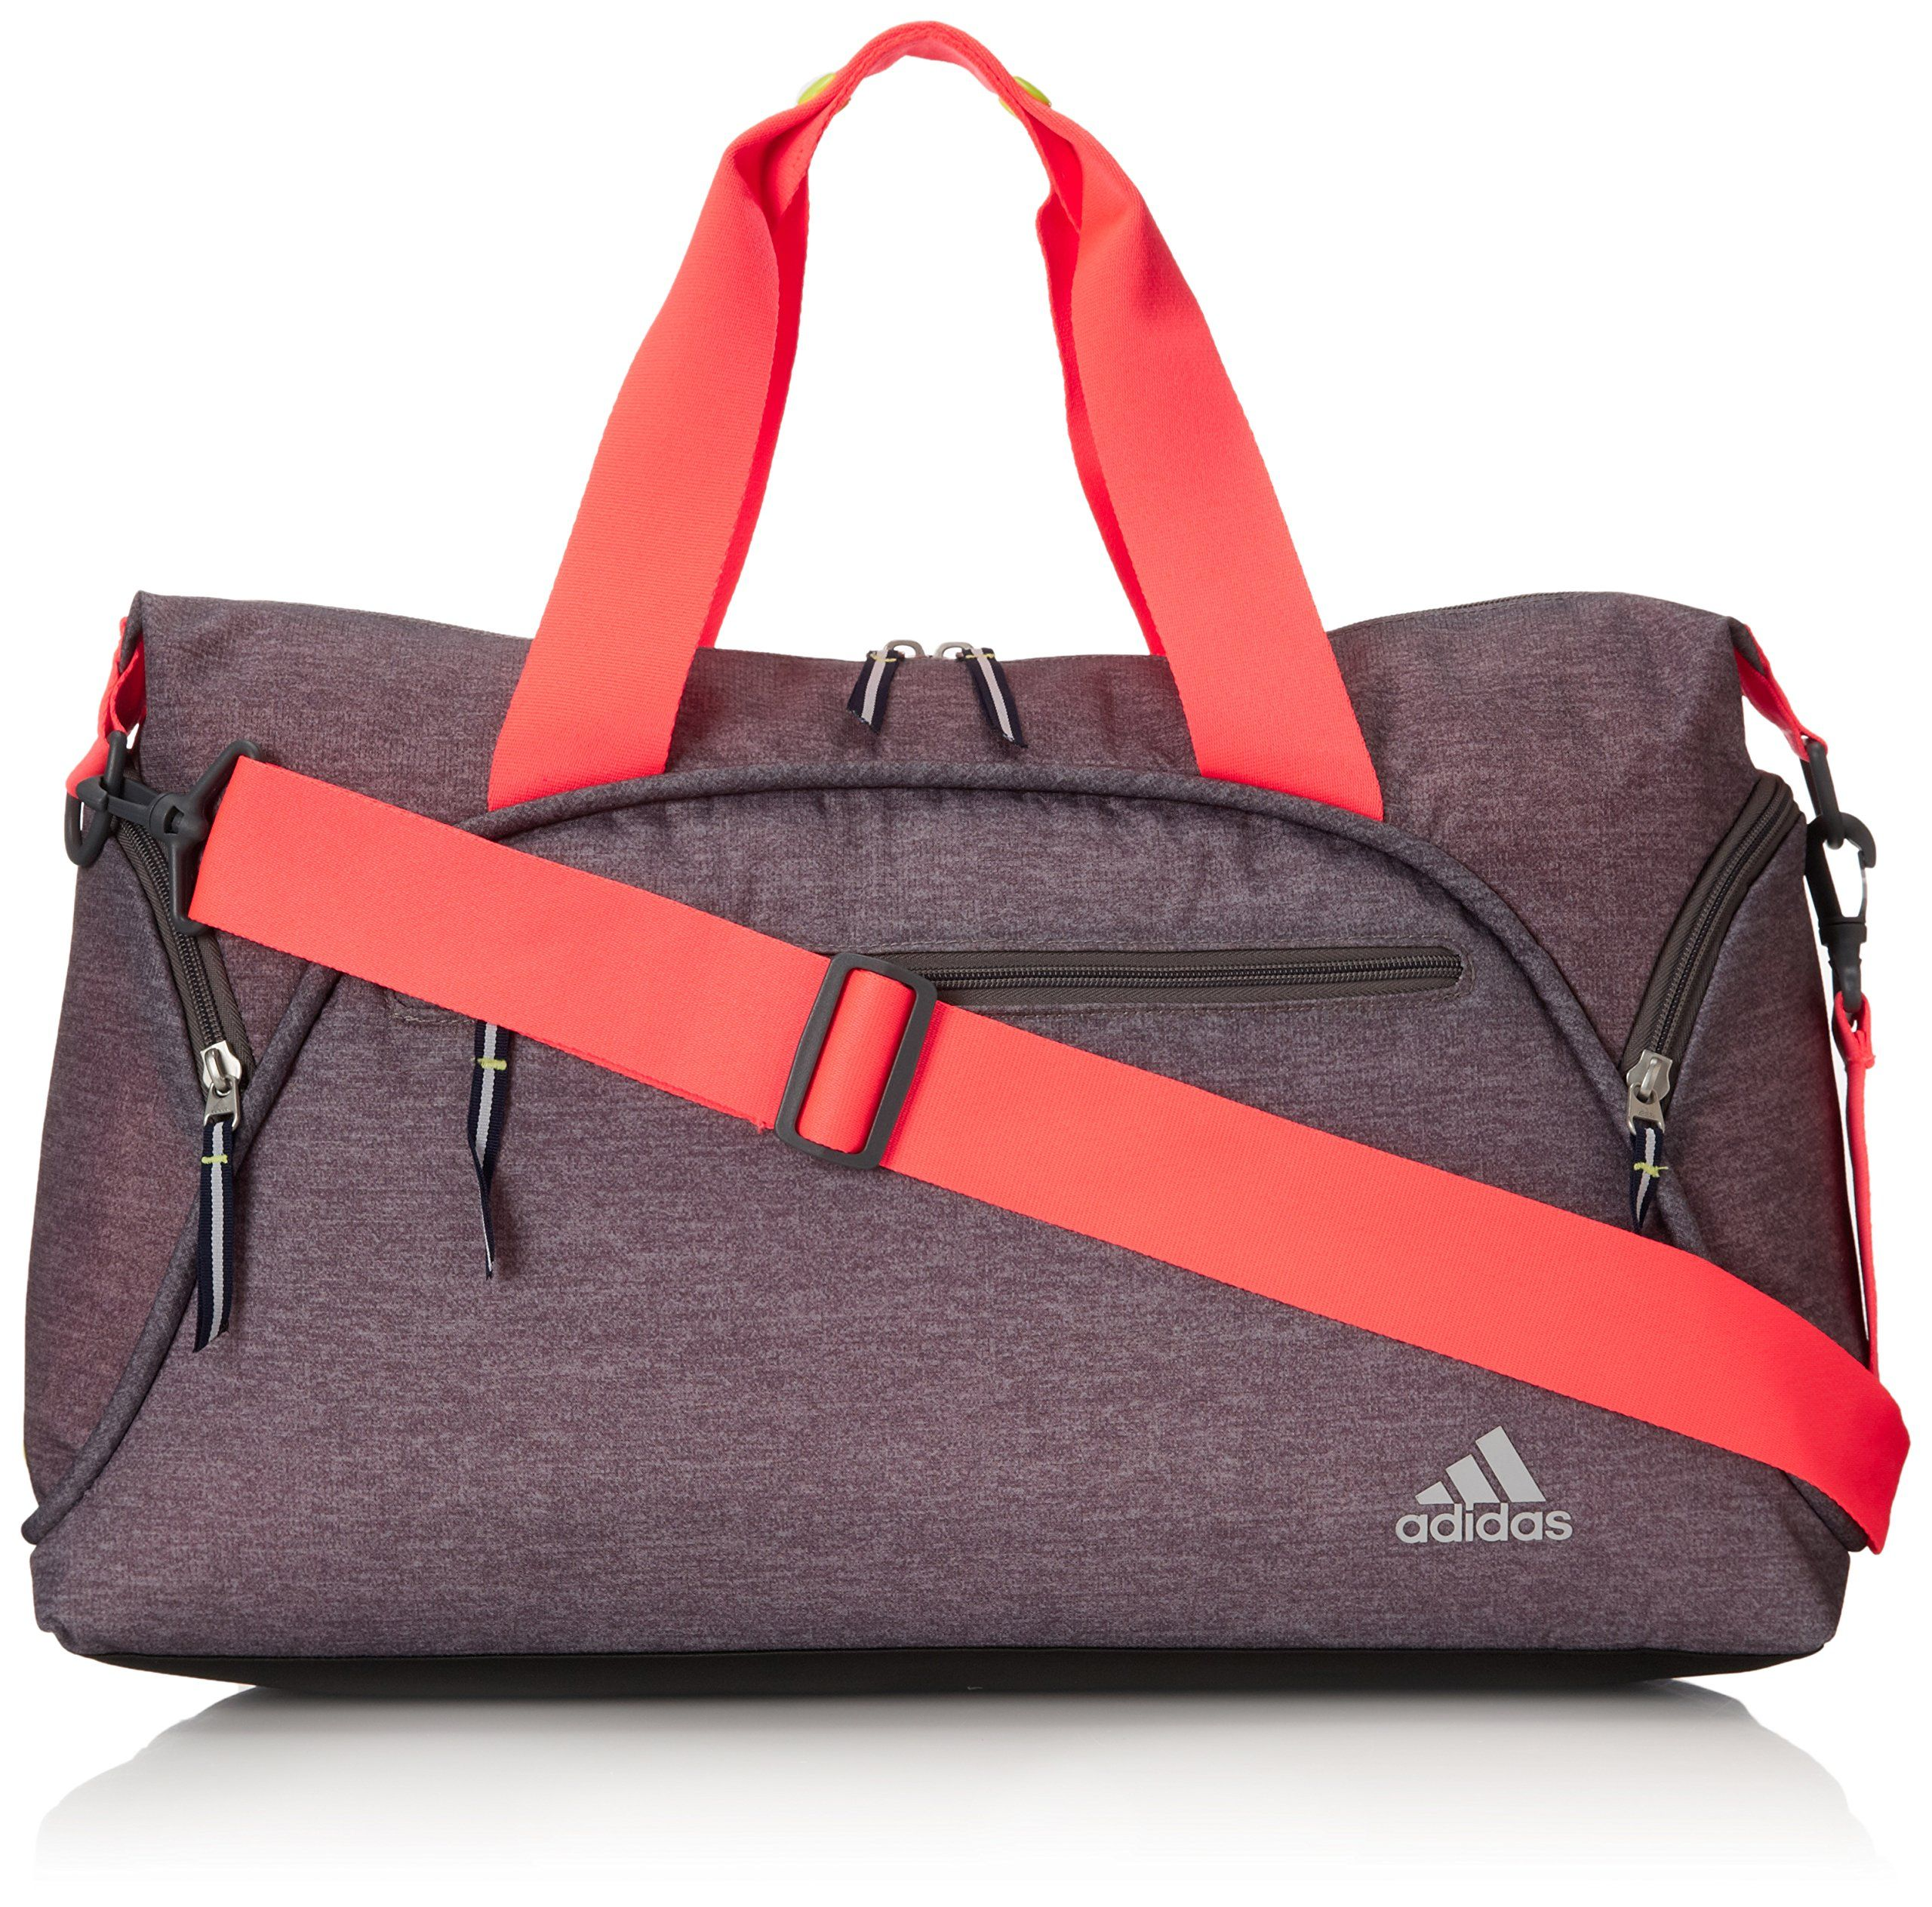 Adidas Women S Fearless Club Bag Heather Grey Static Flash Red